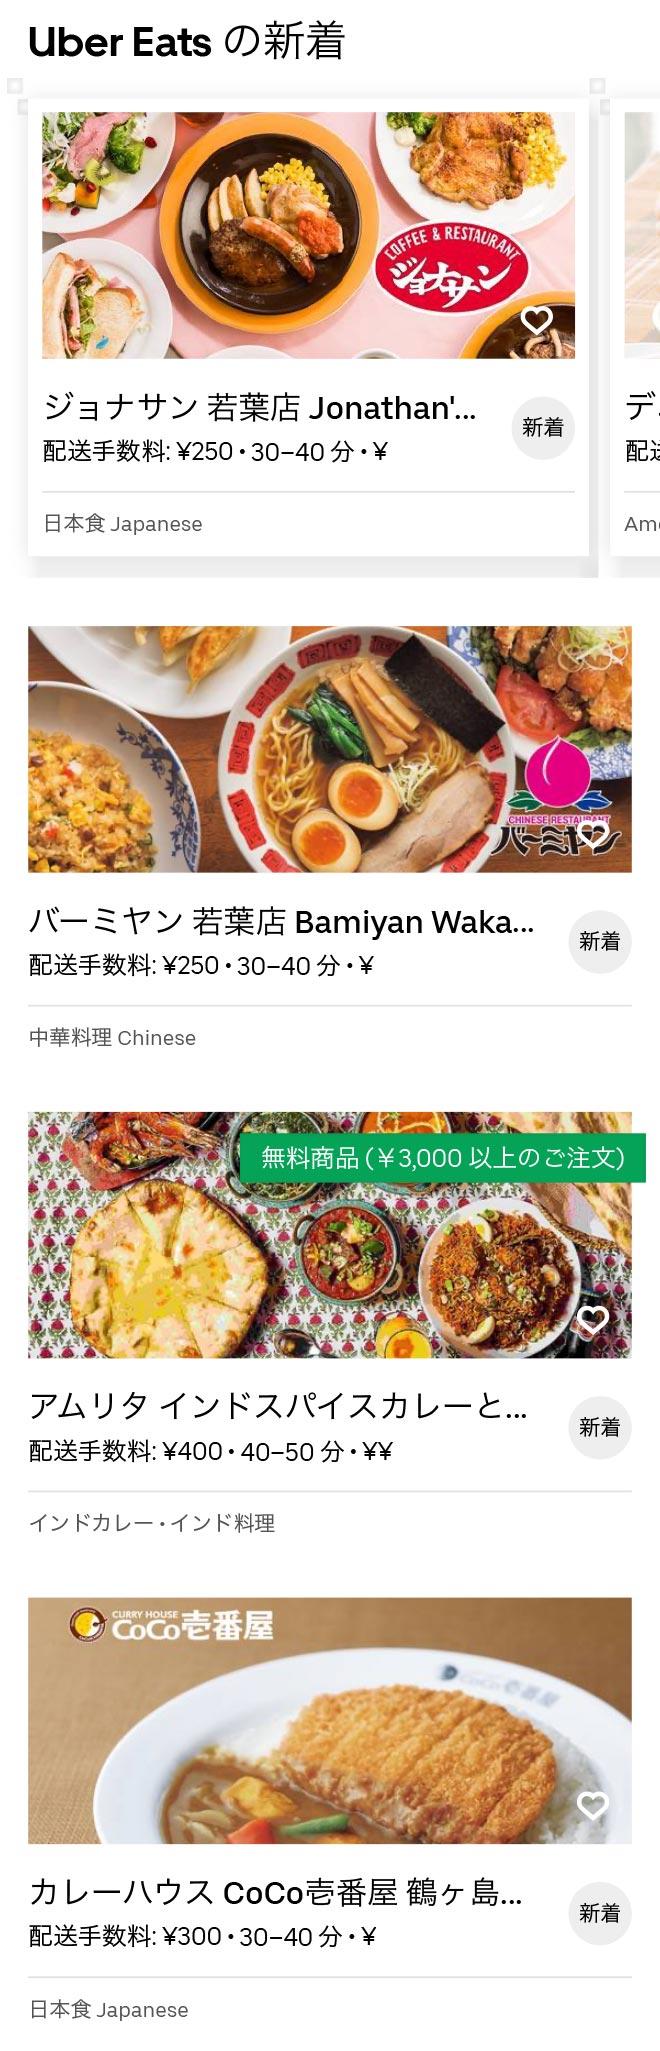 Sakado menu 2010 04